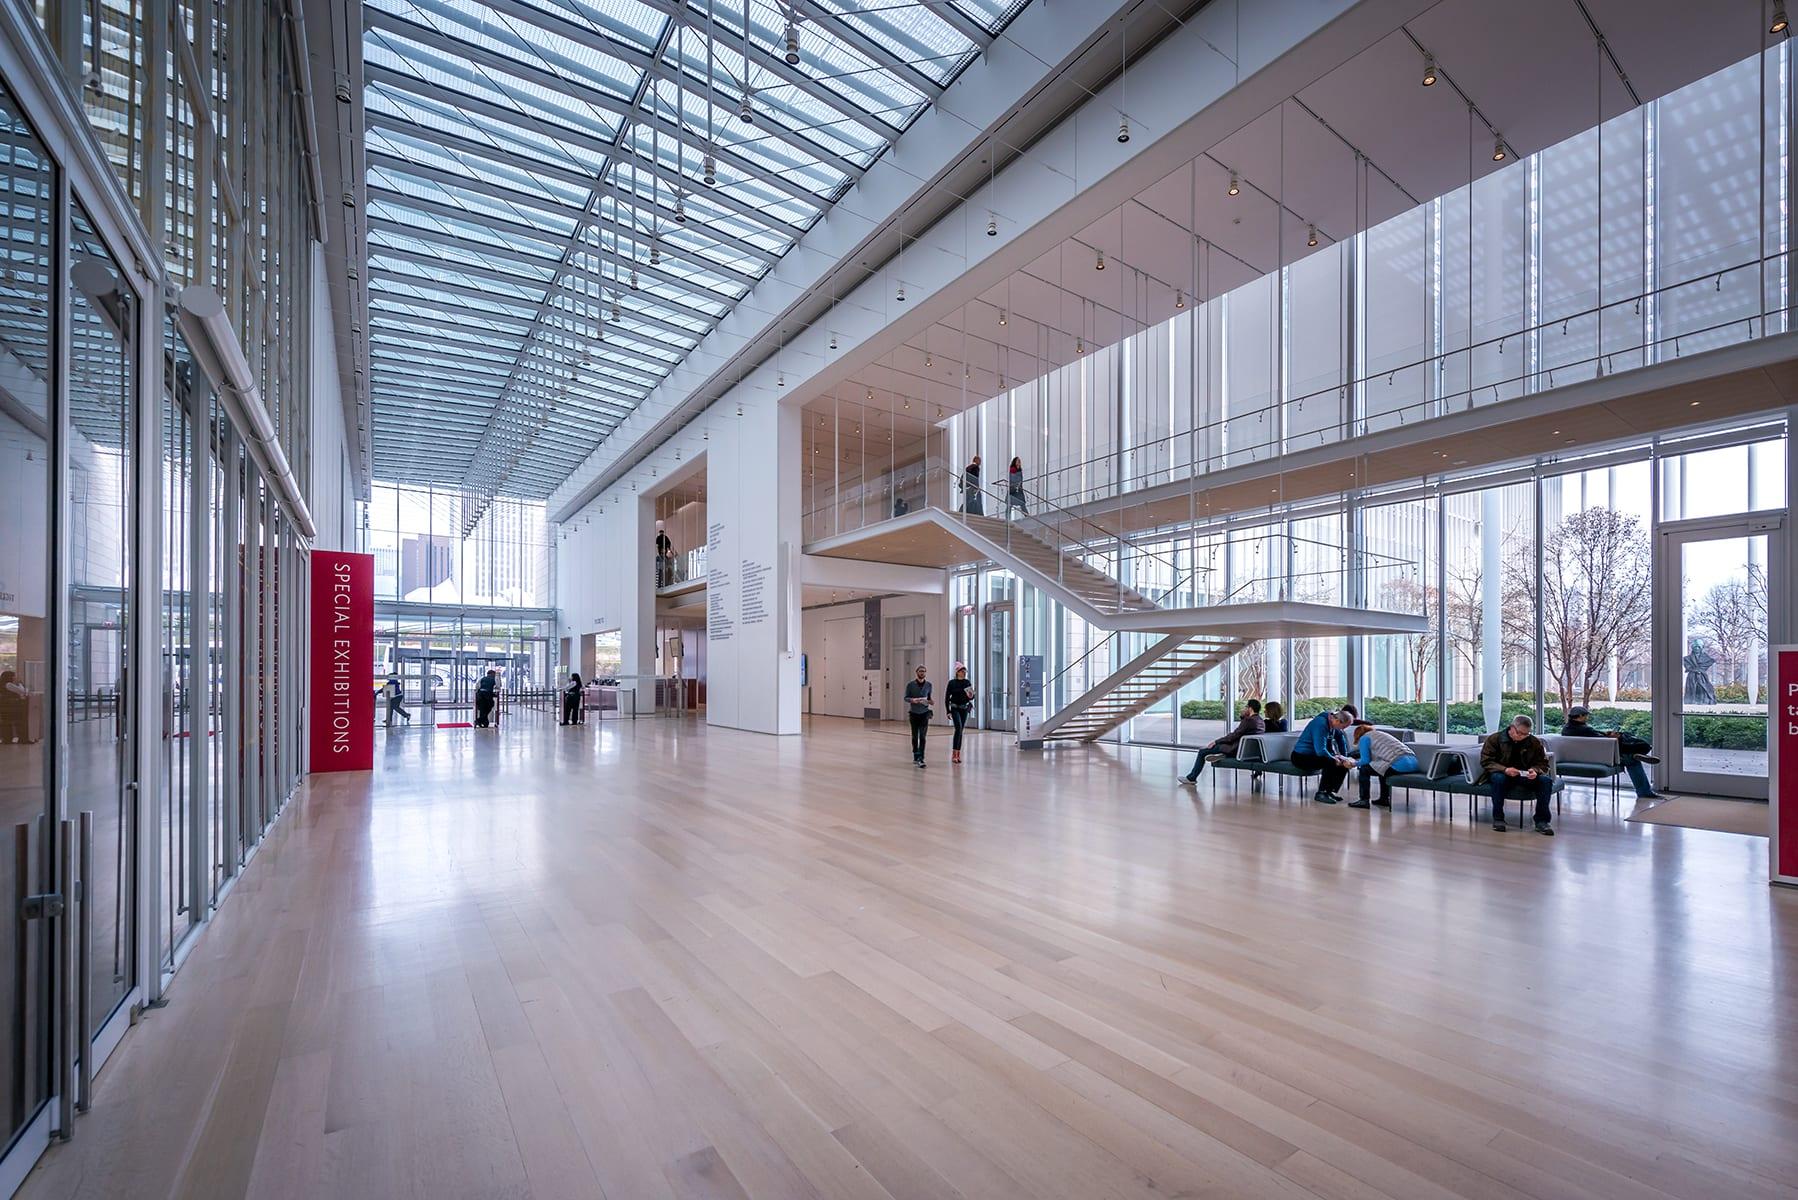 Rpbw Pygmalion Karatzas Modern Wing At The Art Institute Of Chicago Divisare